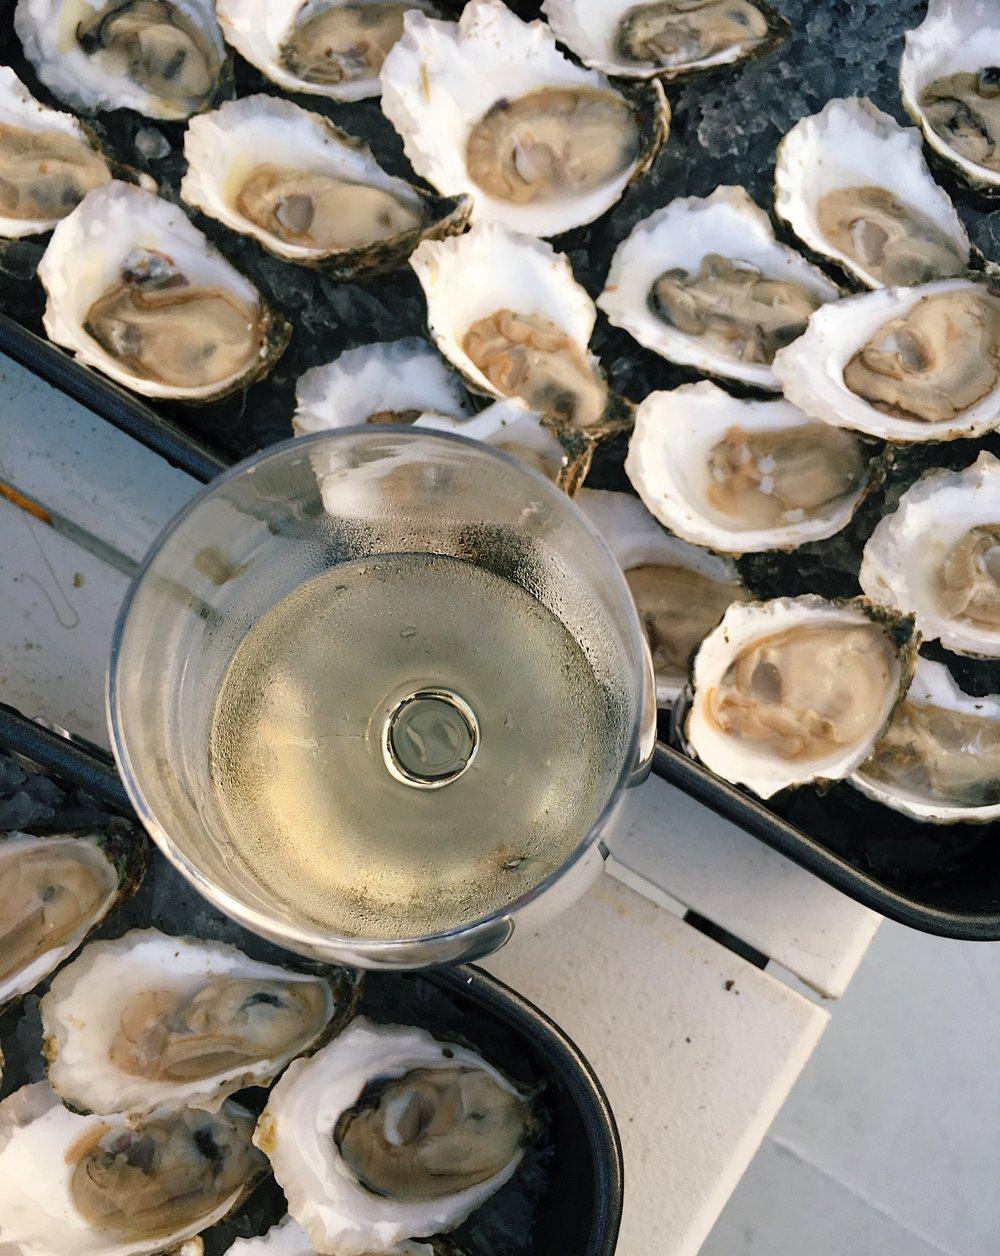 Wine_Wise_Sail_Oysters_portland_maine_2.jpg